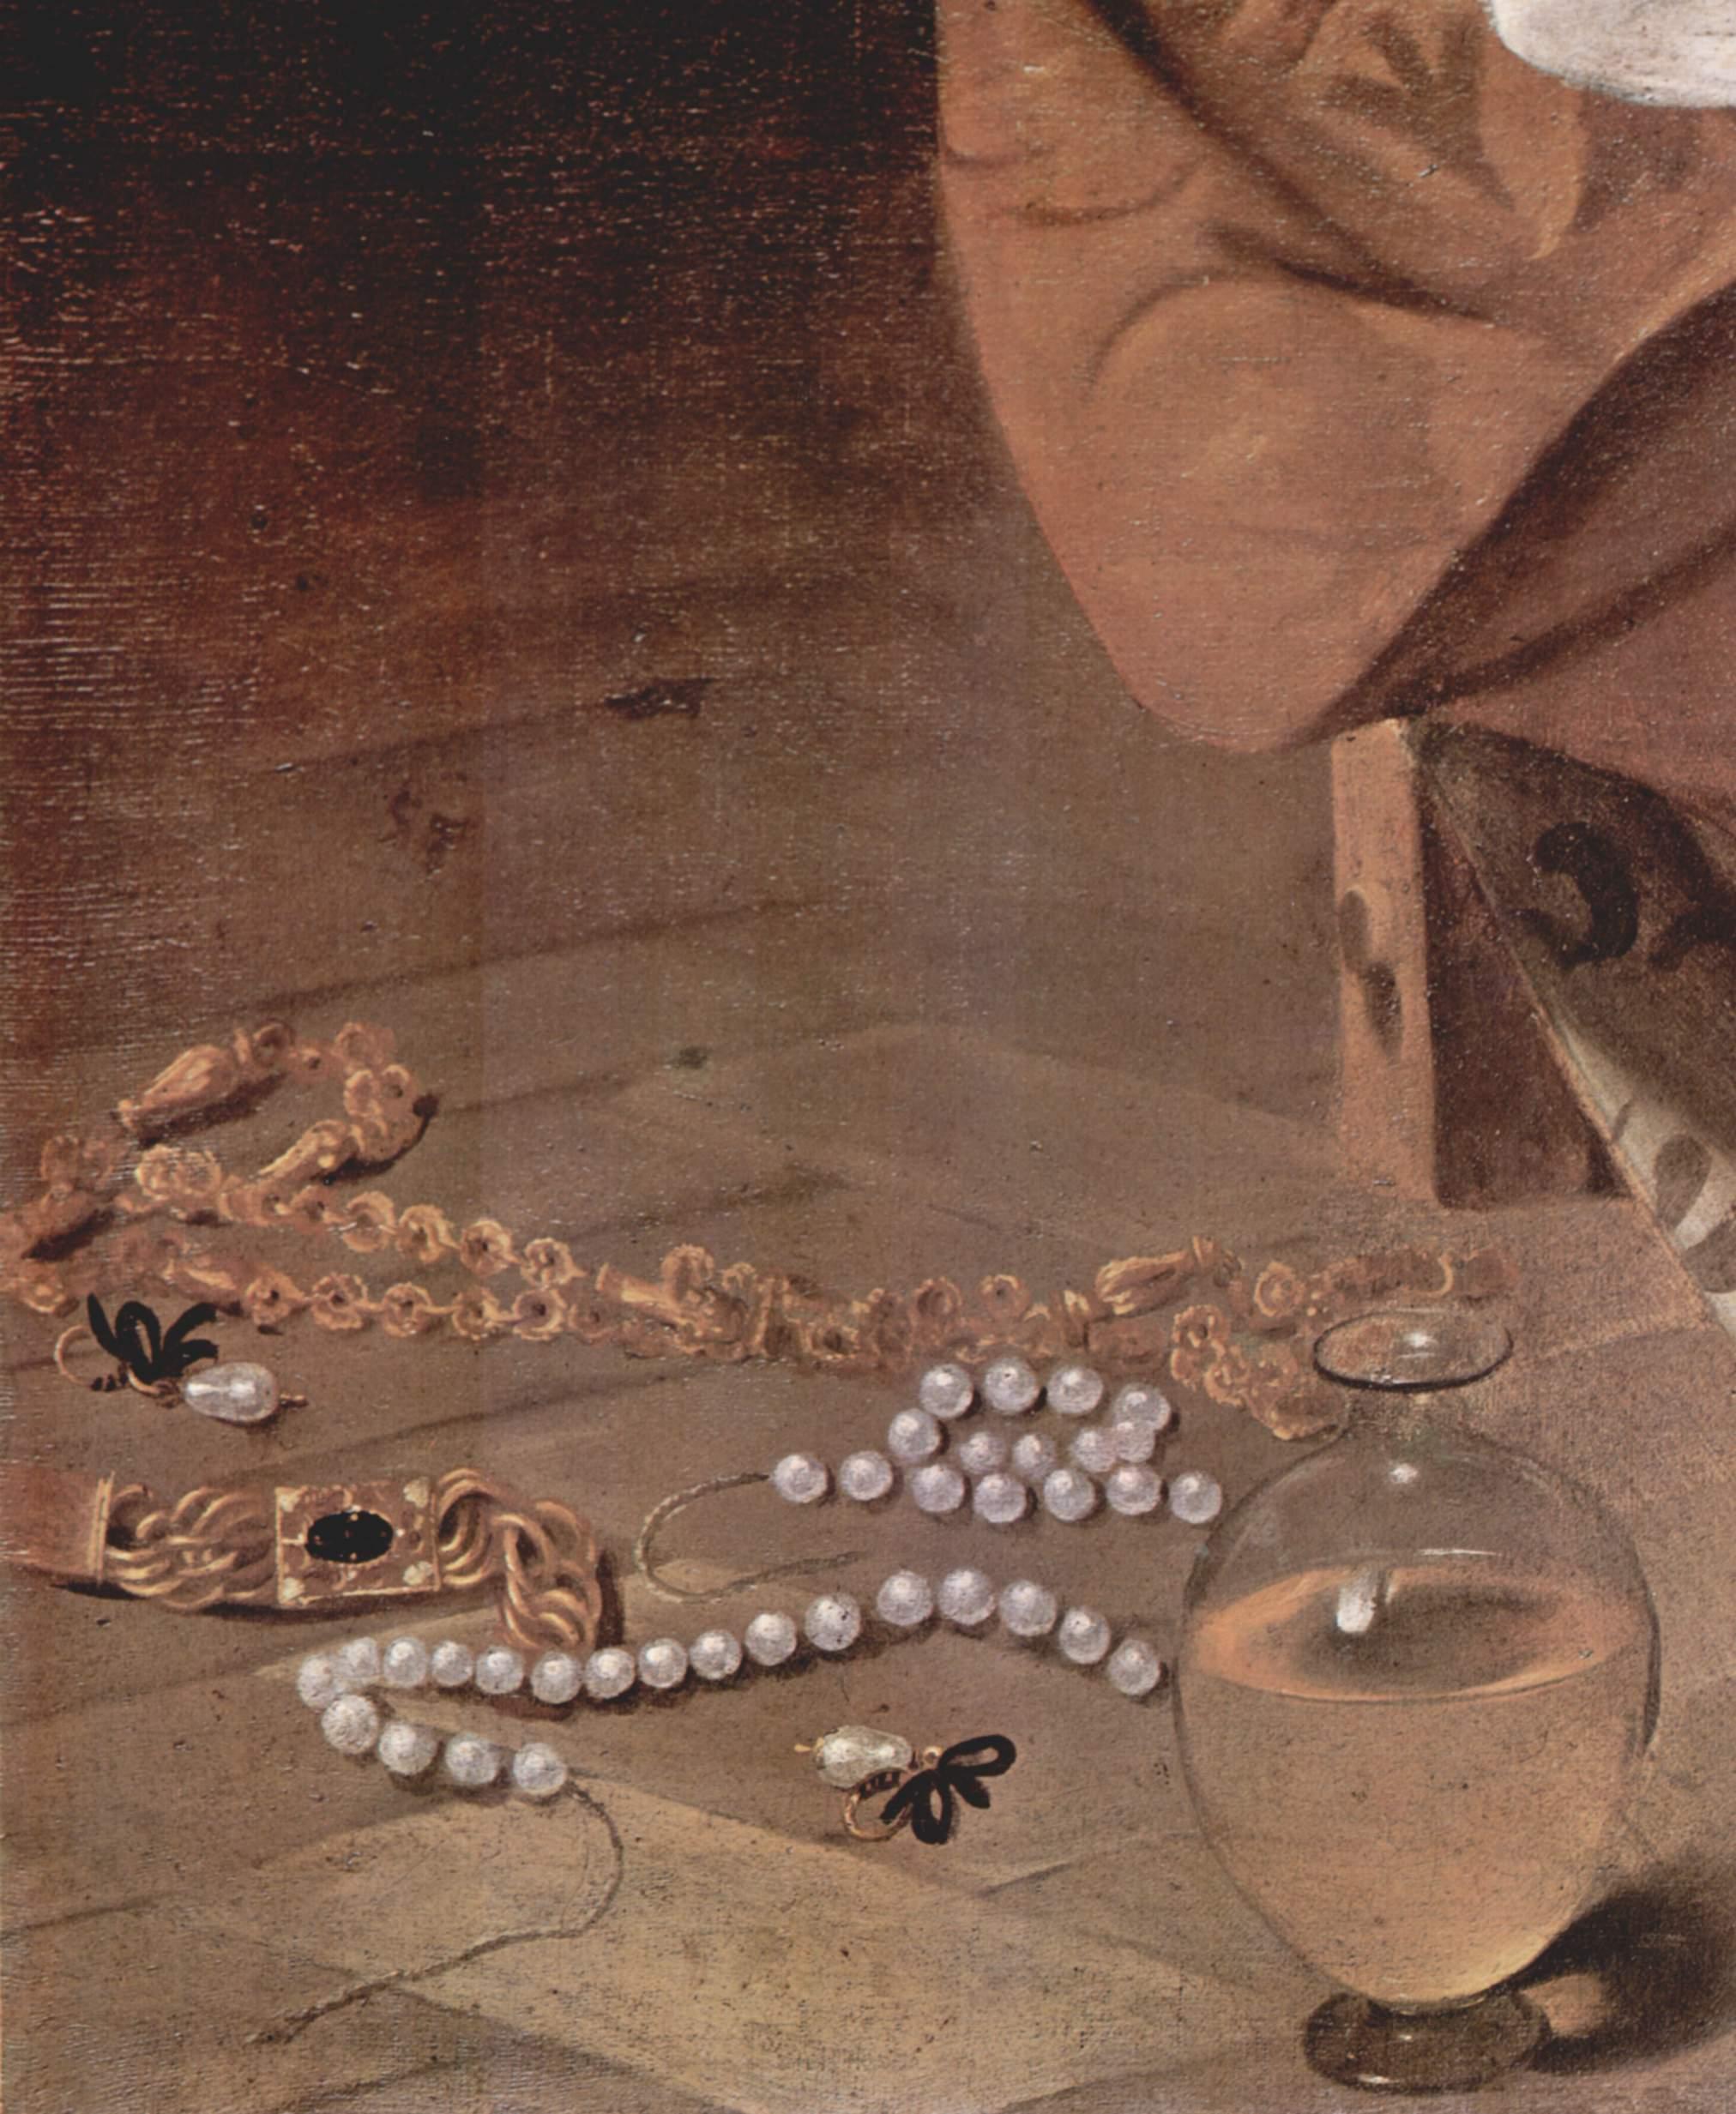 Мария Магдалина. Деталь  жемчужины, Микеланджело Меризи де Караваджо